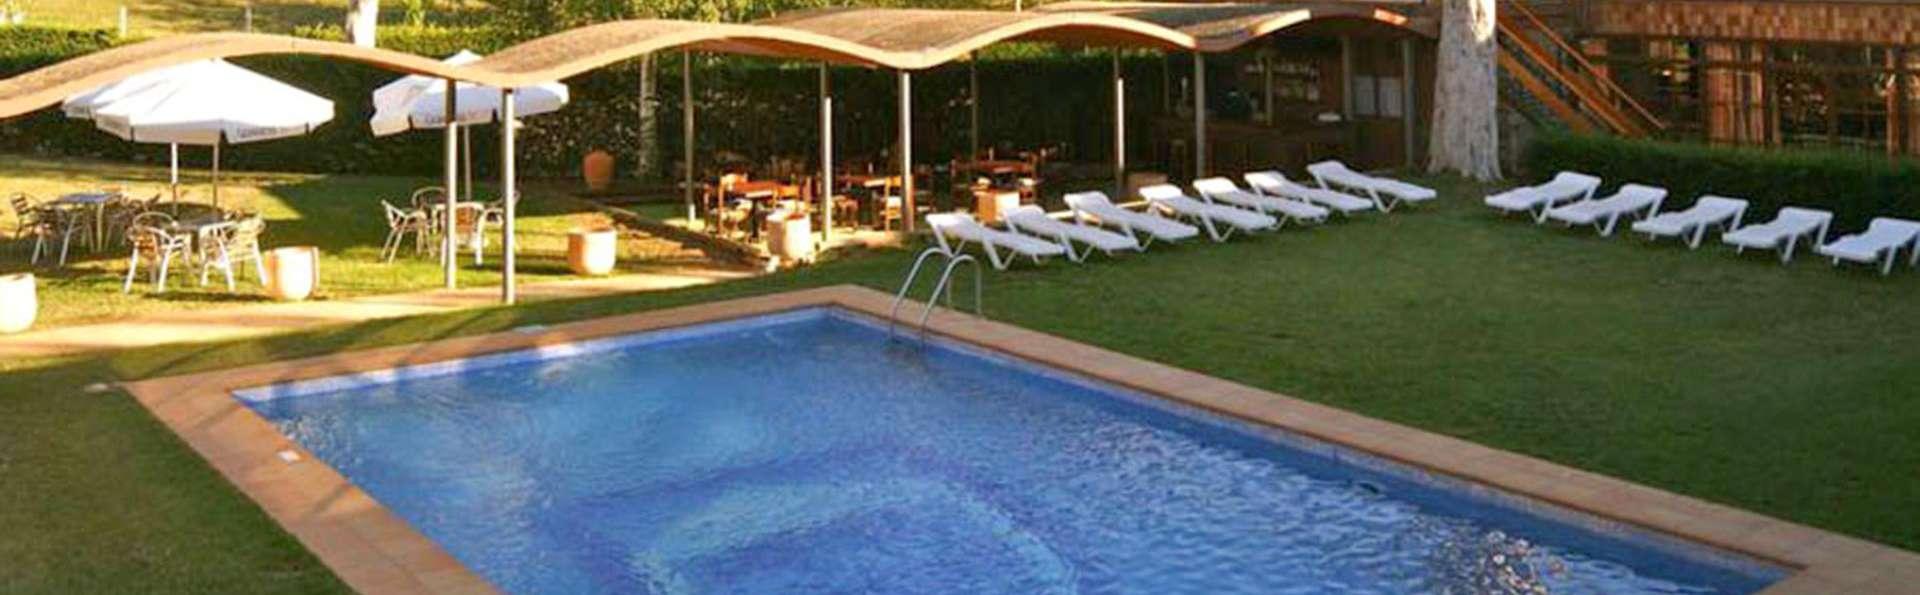 Hotel Moixeró - EDIT_POOL_01.jpg